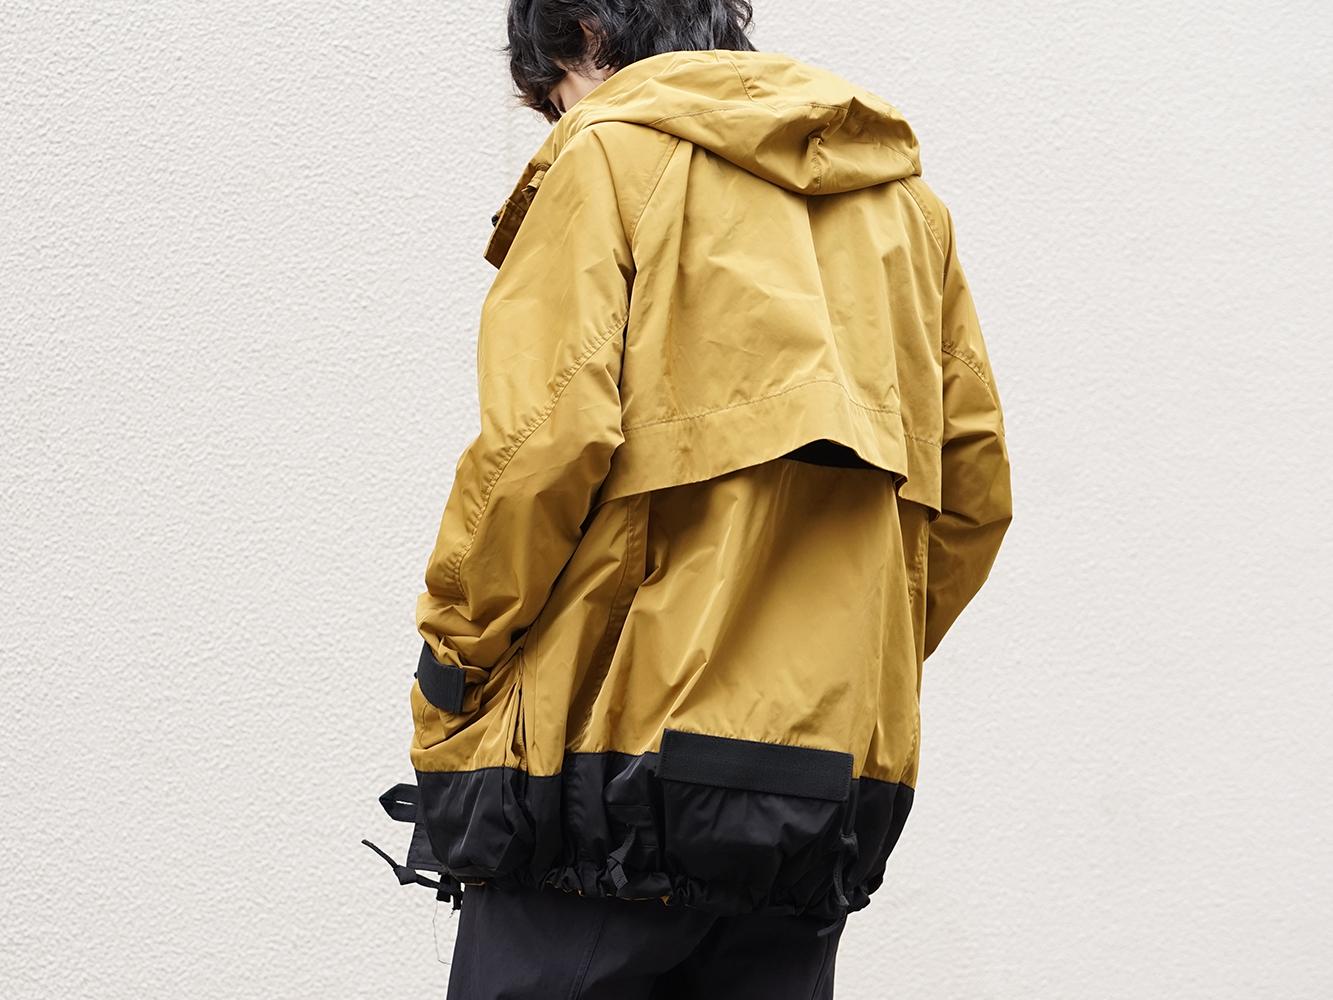 ZIGGY CHEN Mountain Hooded Jacket Winter Style